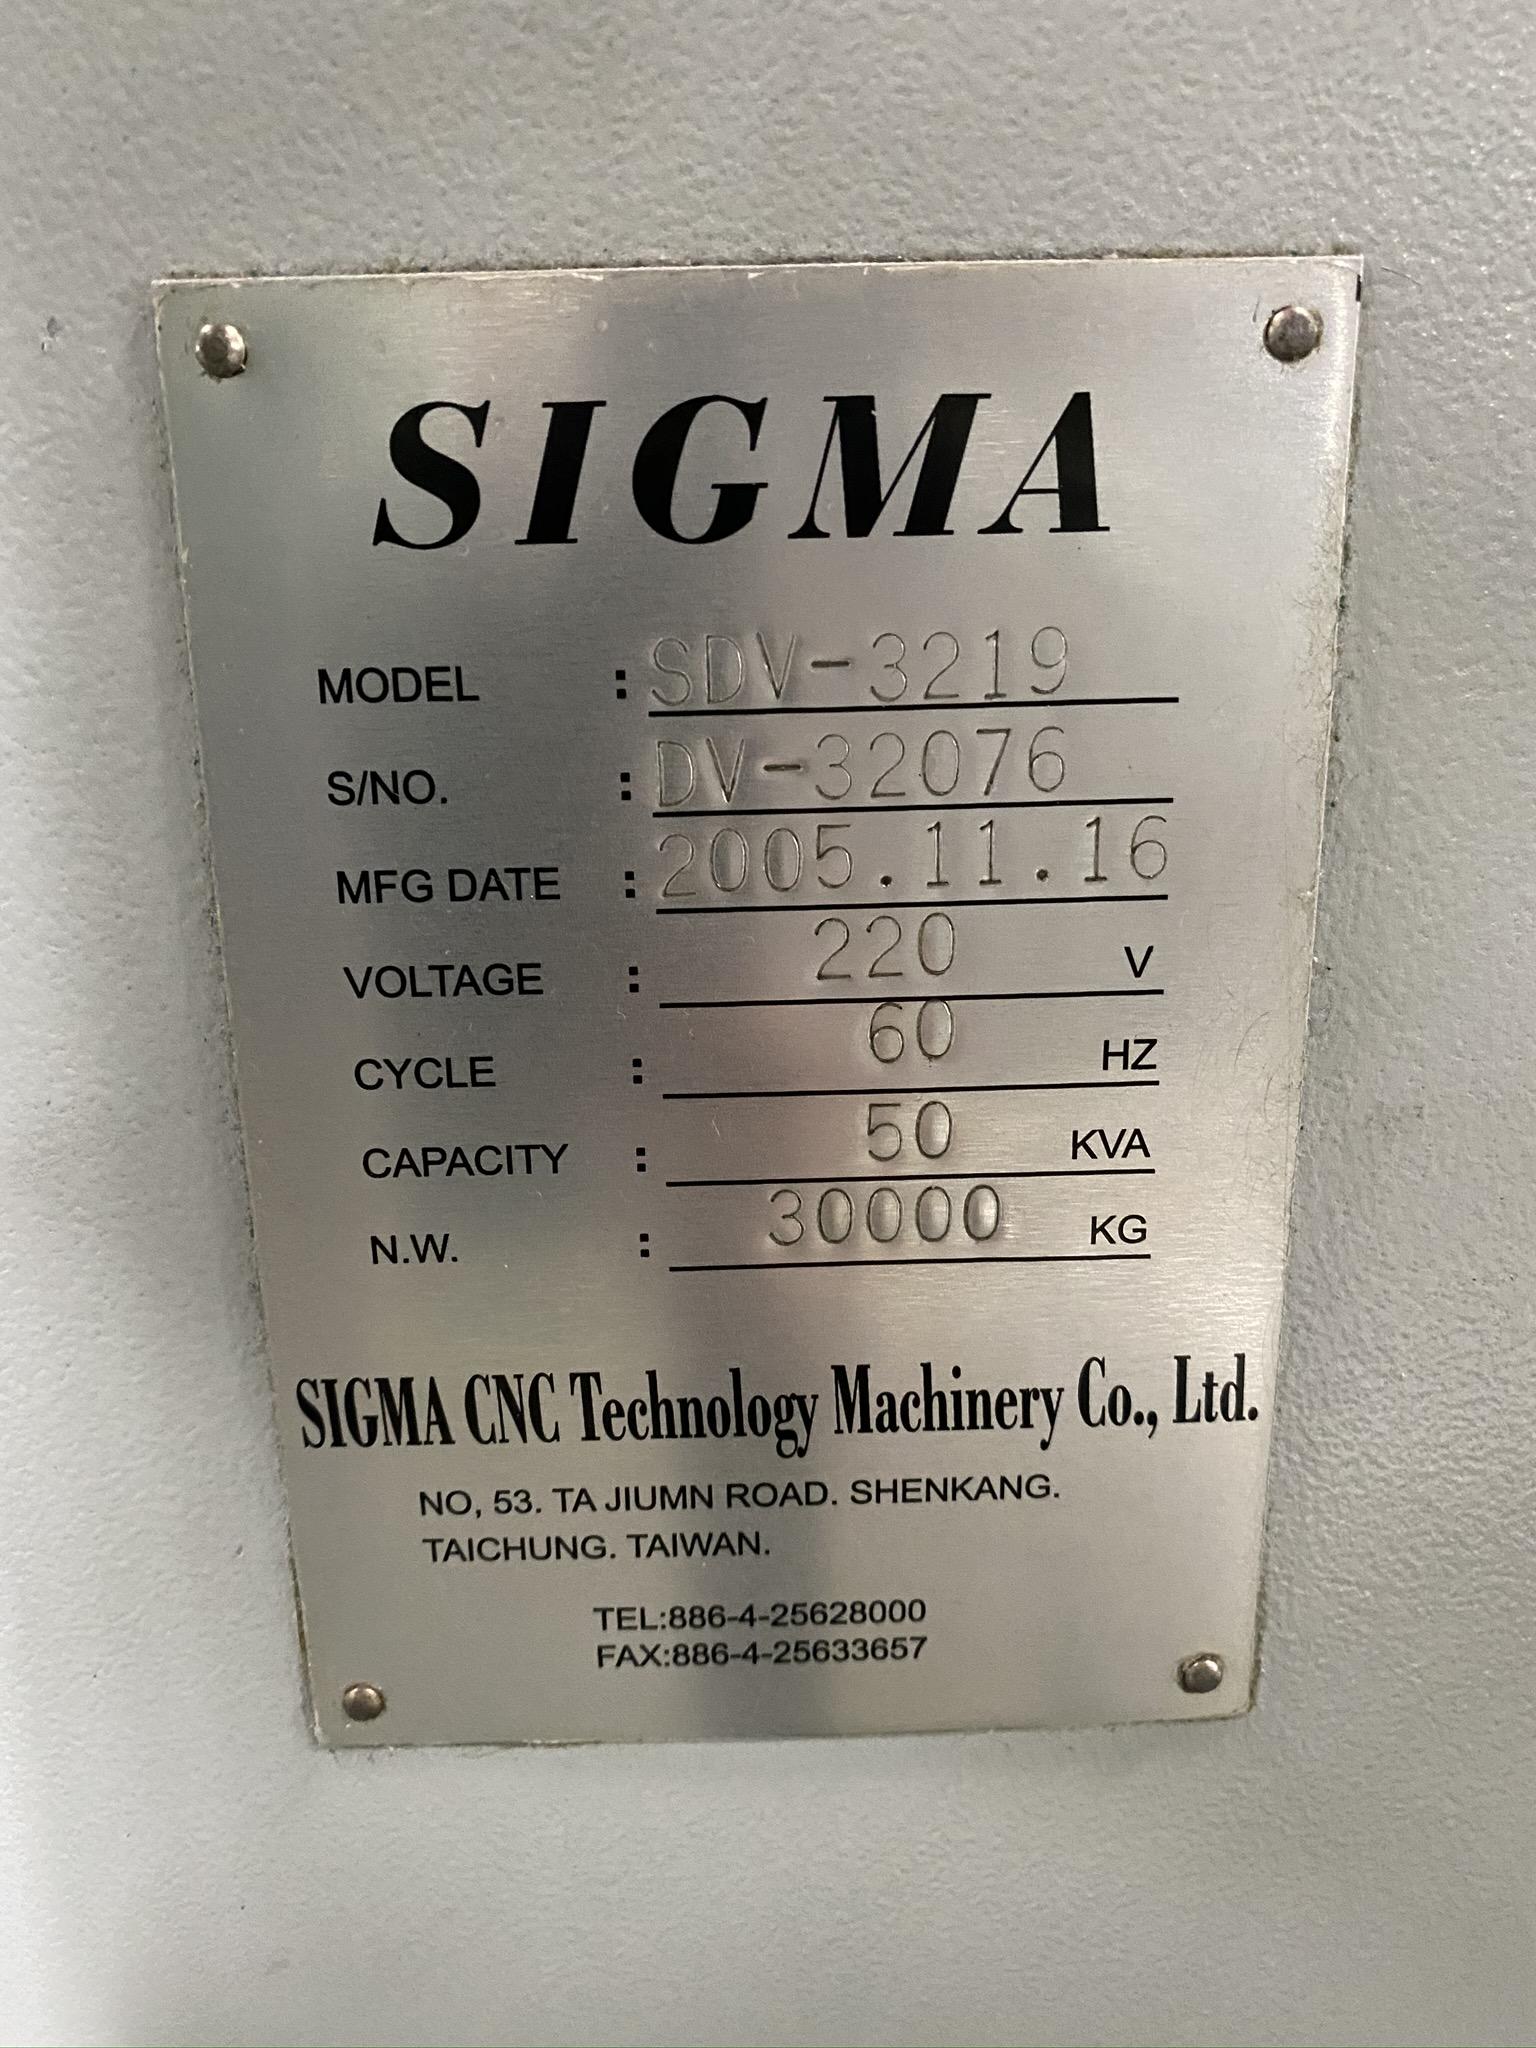 2005 SIGMA CNC DOUBLE COLUMN MACHINING CENTER, MODEL SDV-3219, FANUC 18IMB CNC CONTROL - Image 31 of 31